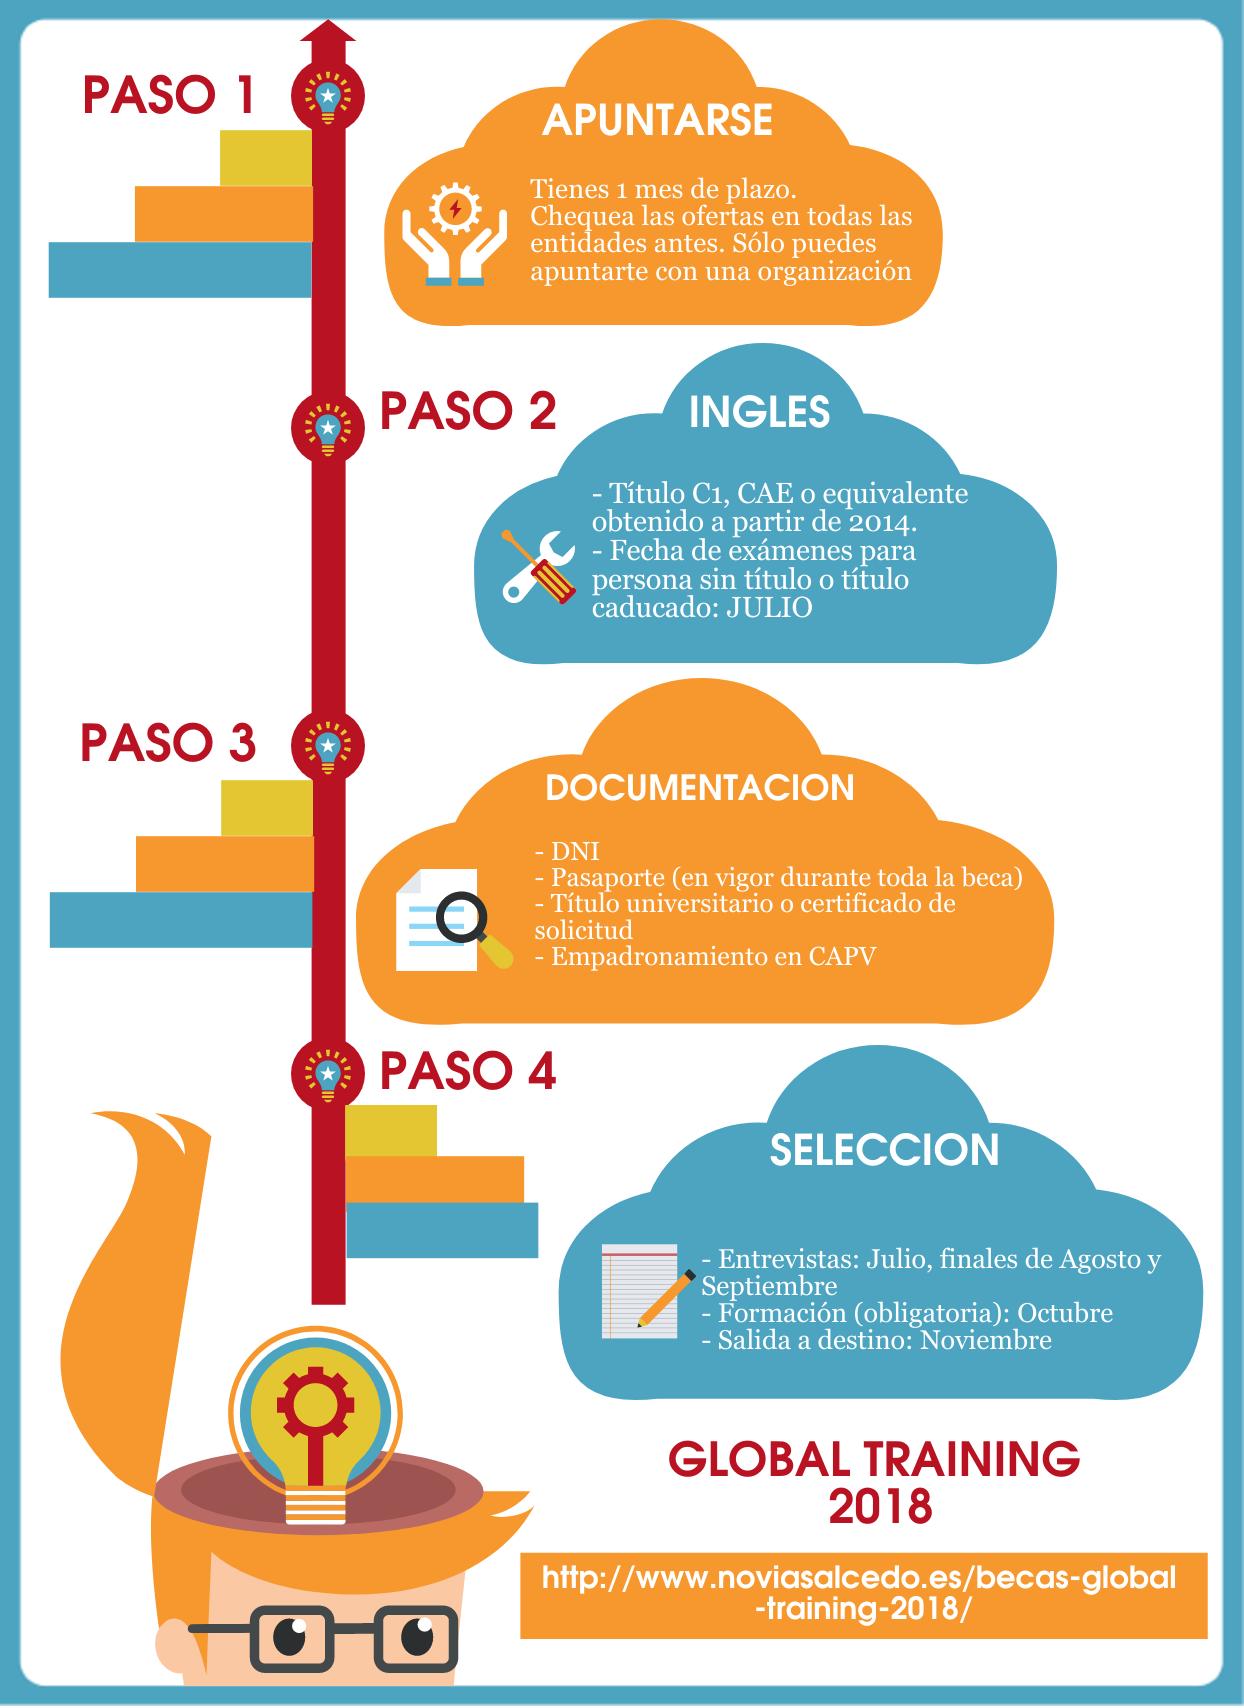 global-training-2018-recomendaciones